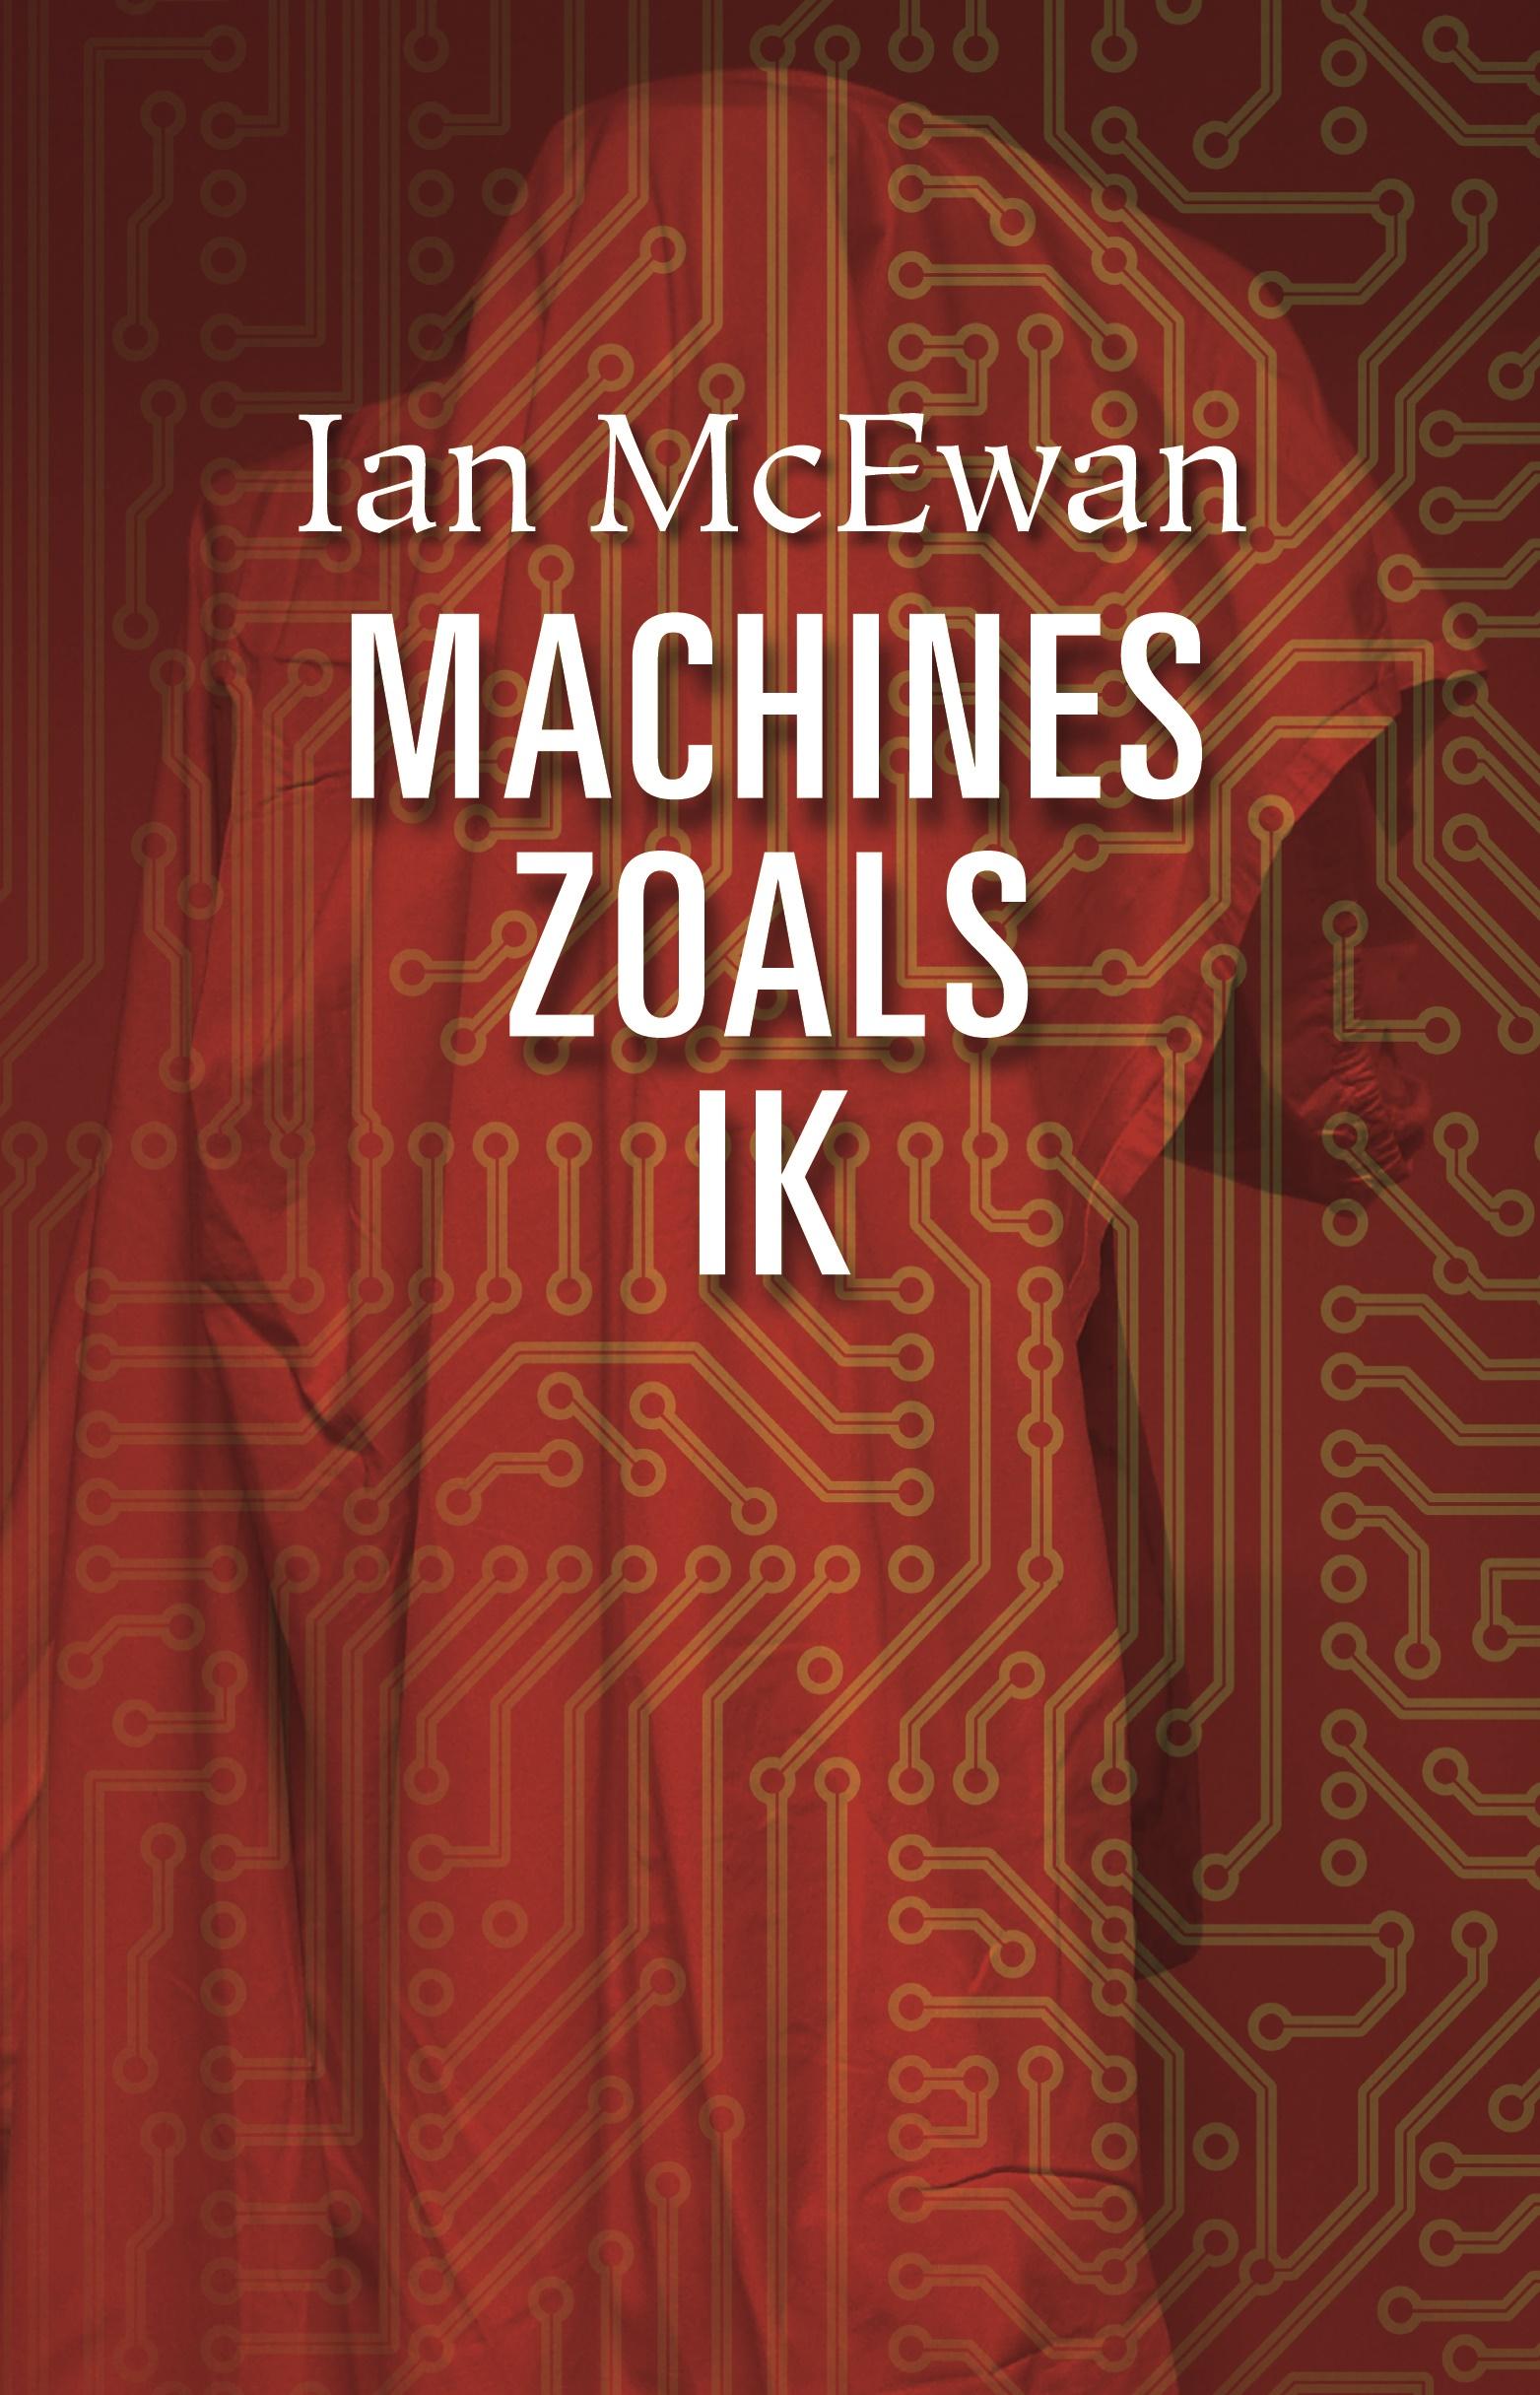 McEwan-Machines-zoals-ik